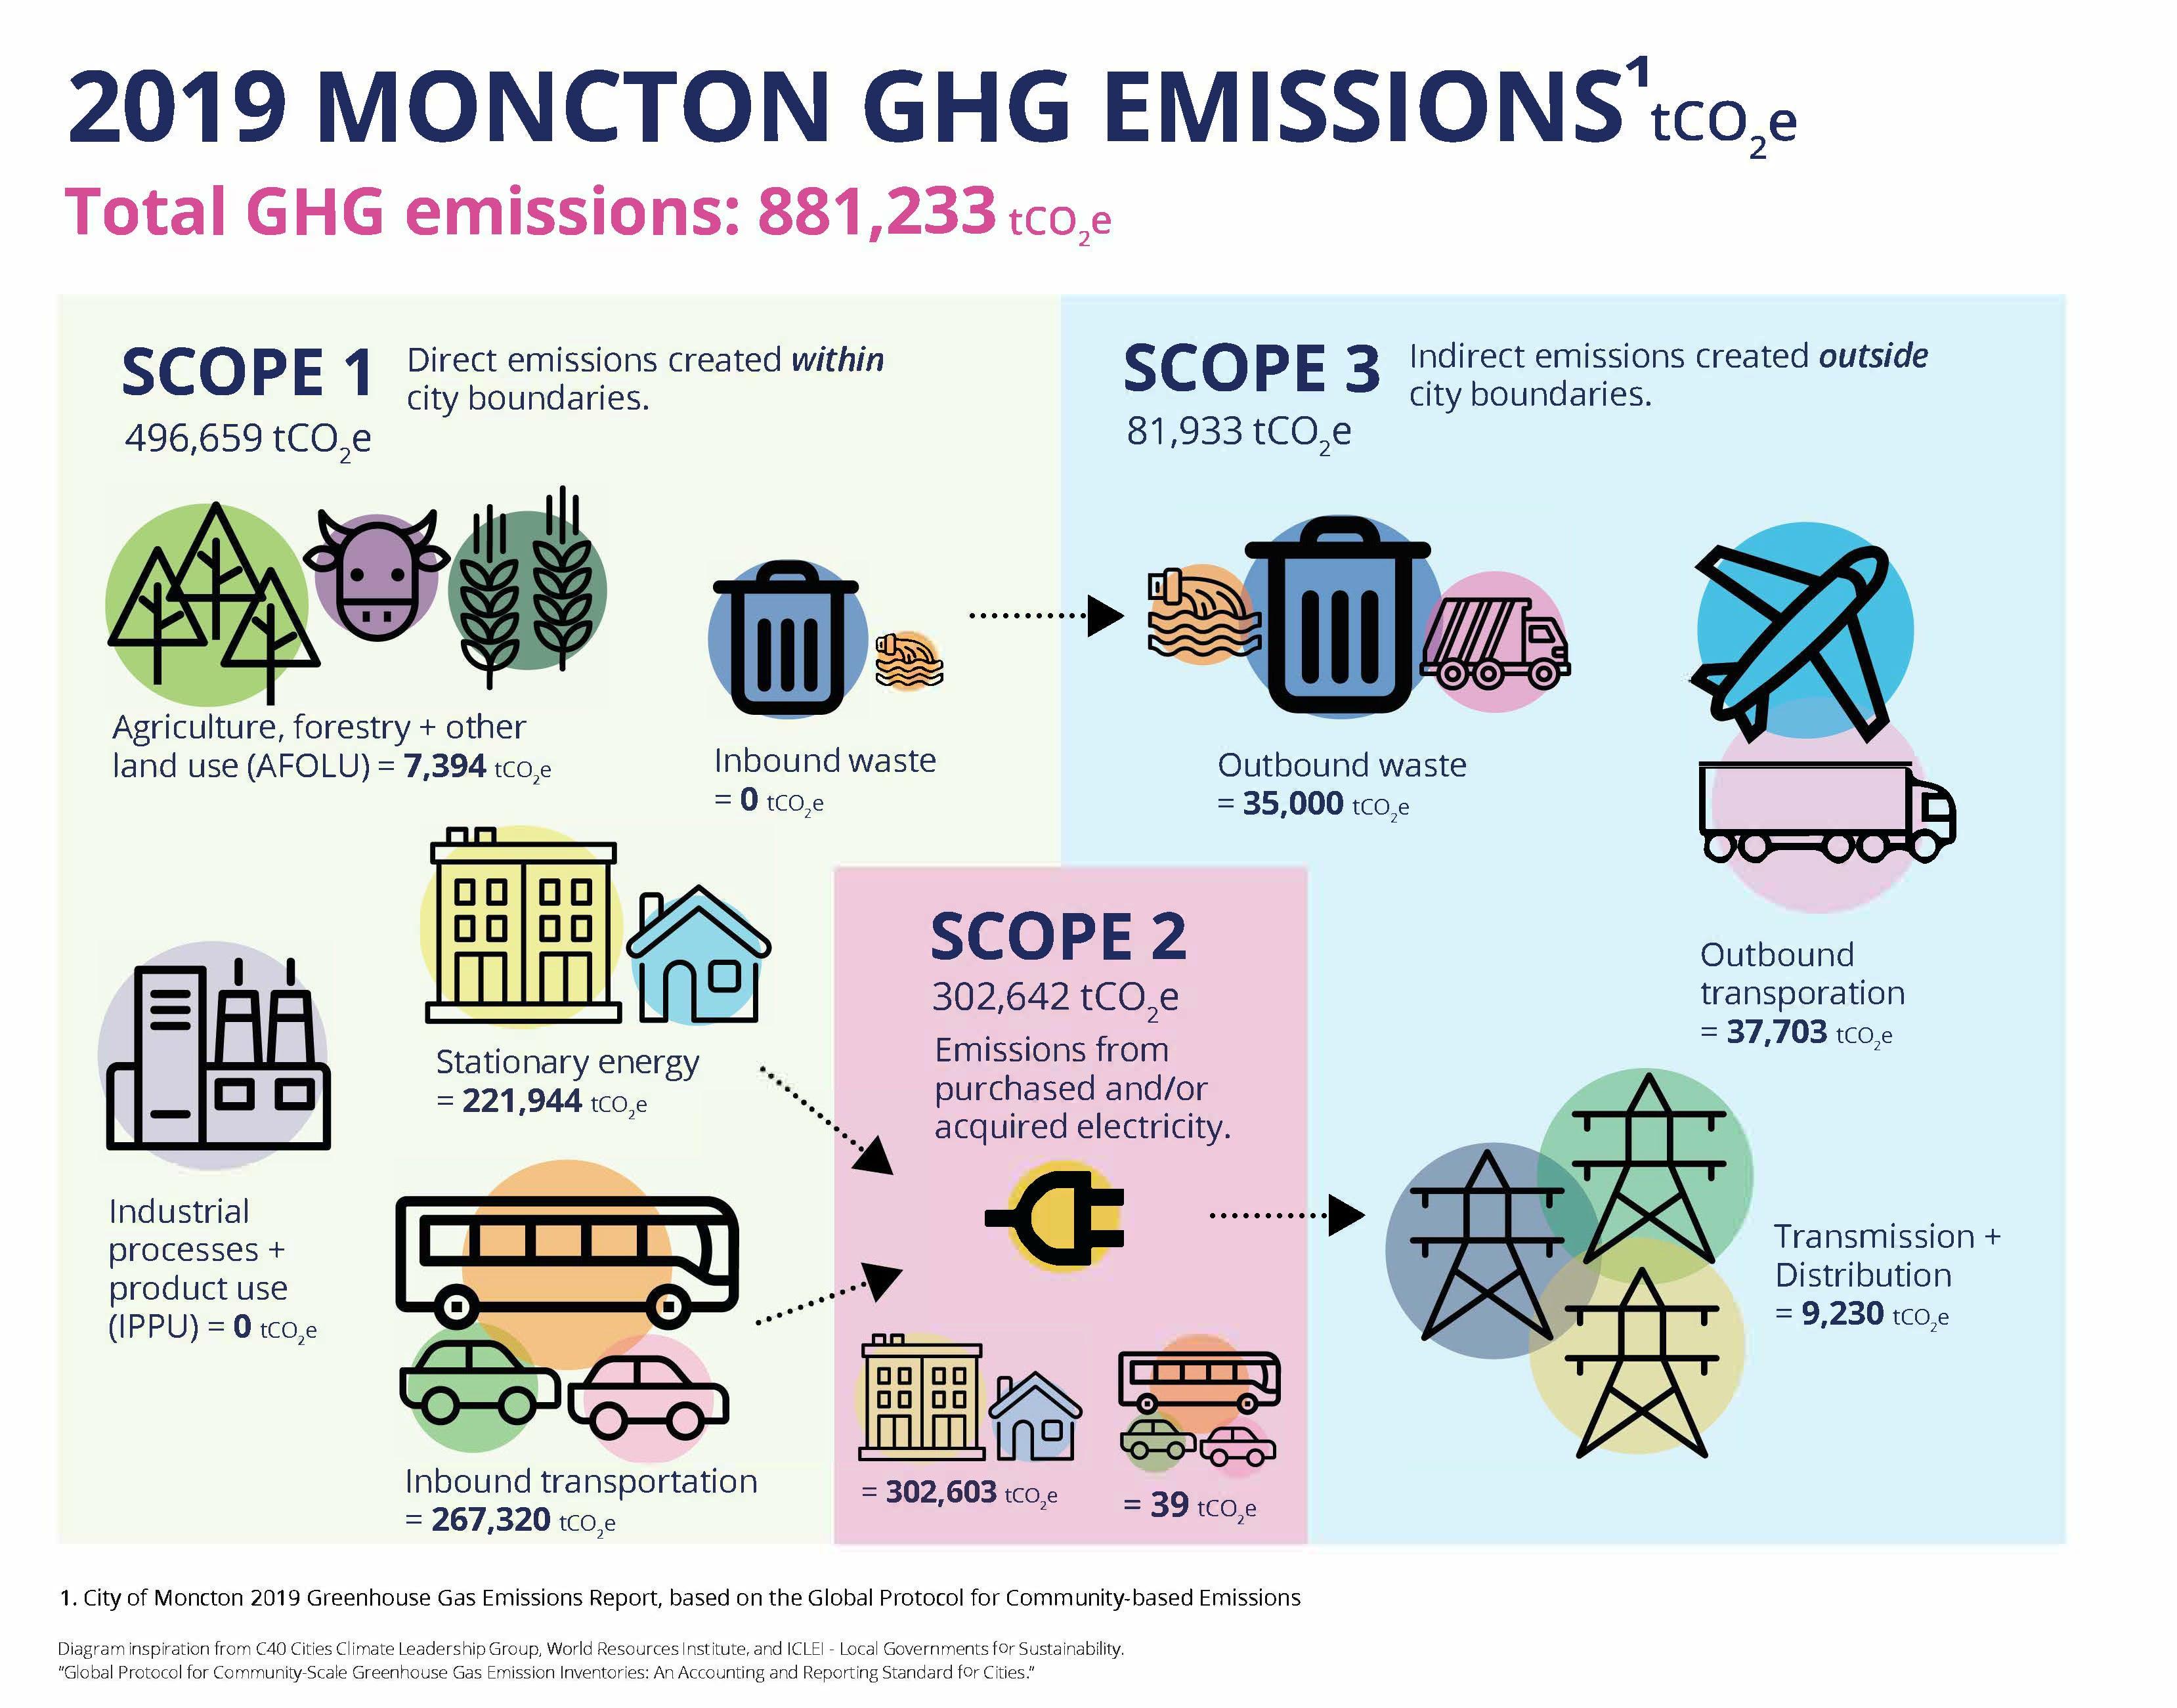 Moncton 2019 Emissions Scopes Infographic